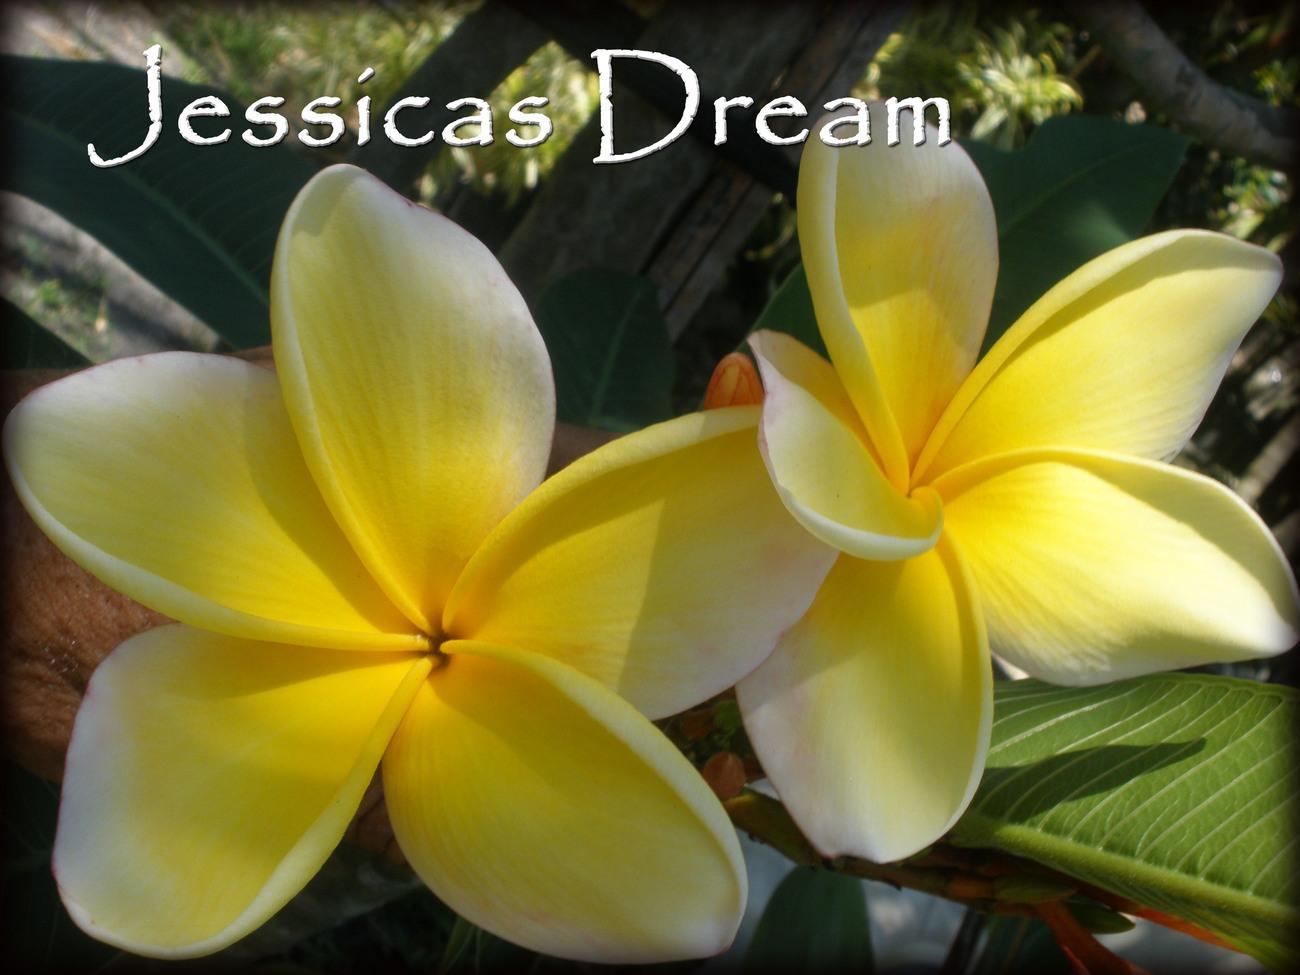 RARE & EXOTIC! Jessicas Dream Hawaiian Plumeria Cutting